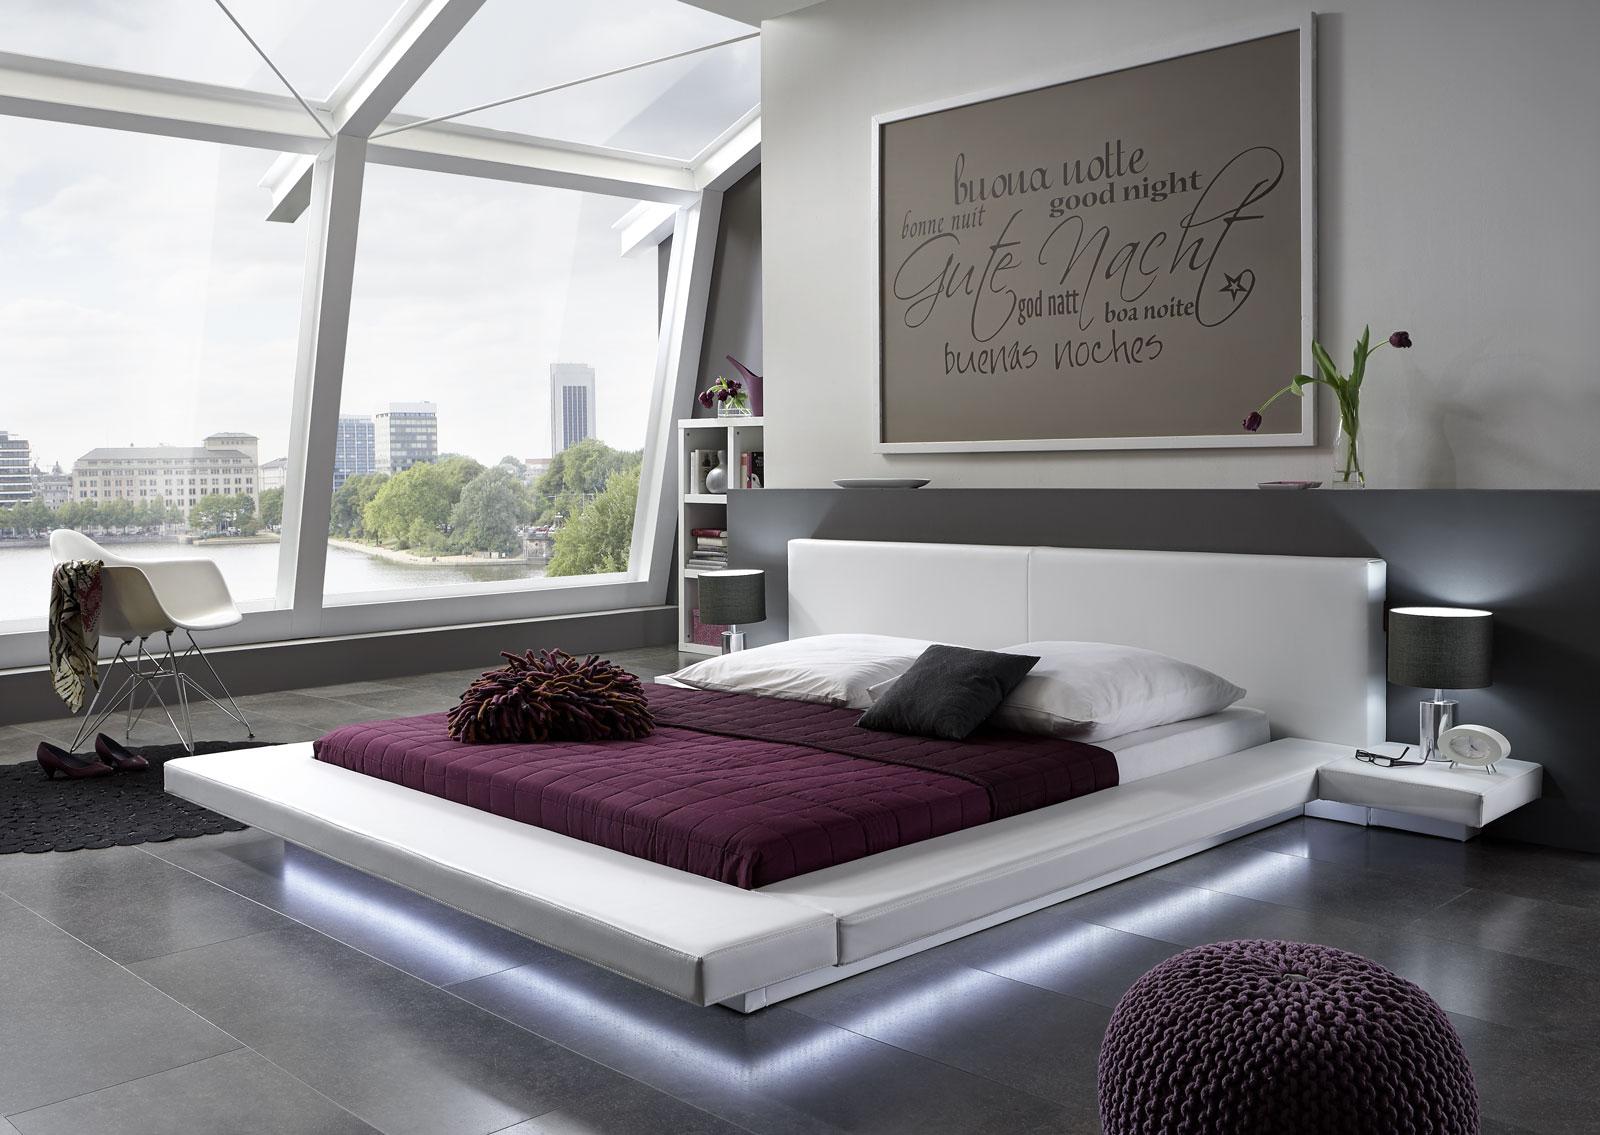 sam polsterbett 200 x 200 cm wei perla led. Black Bedroom Furniture Sets. Home Design Ideas